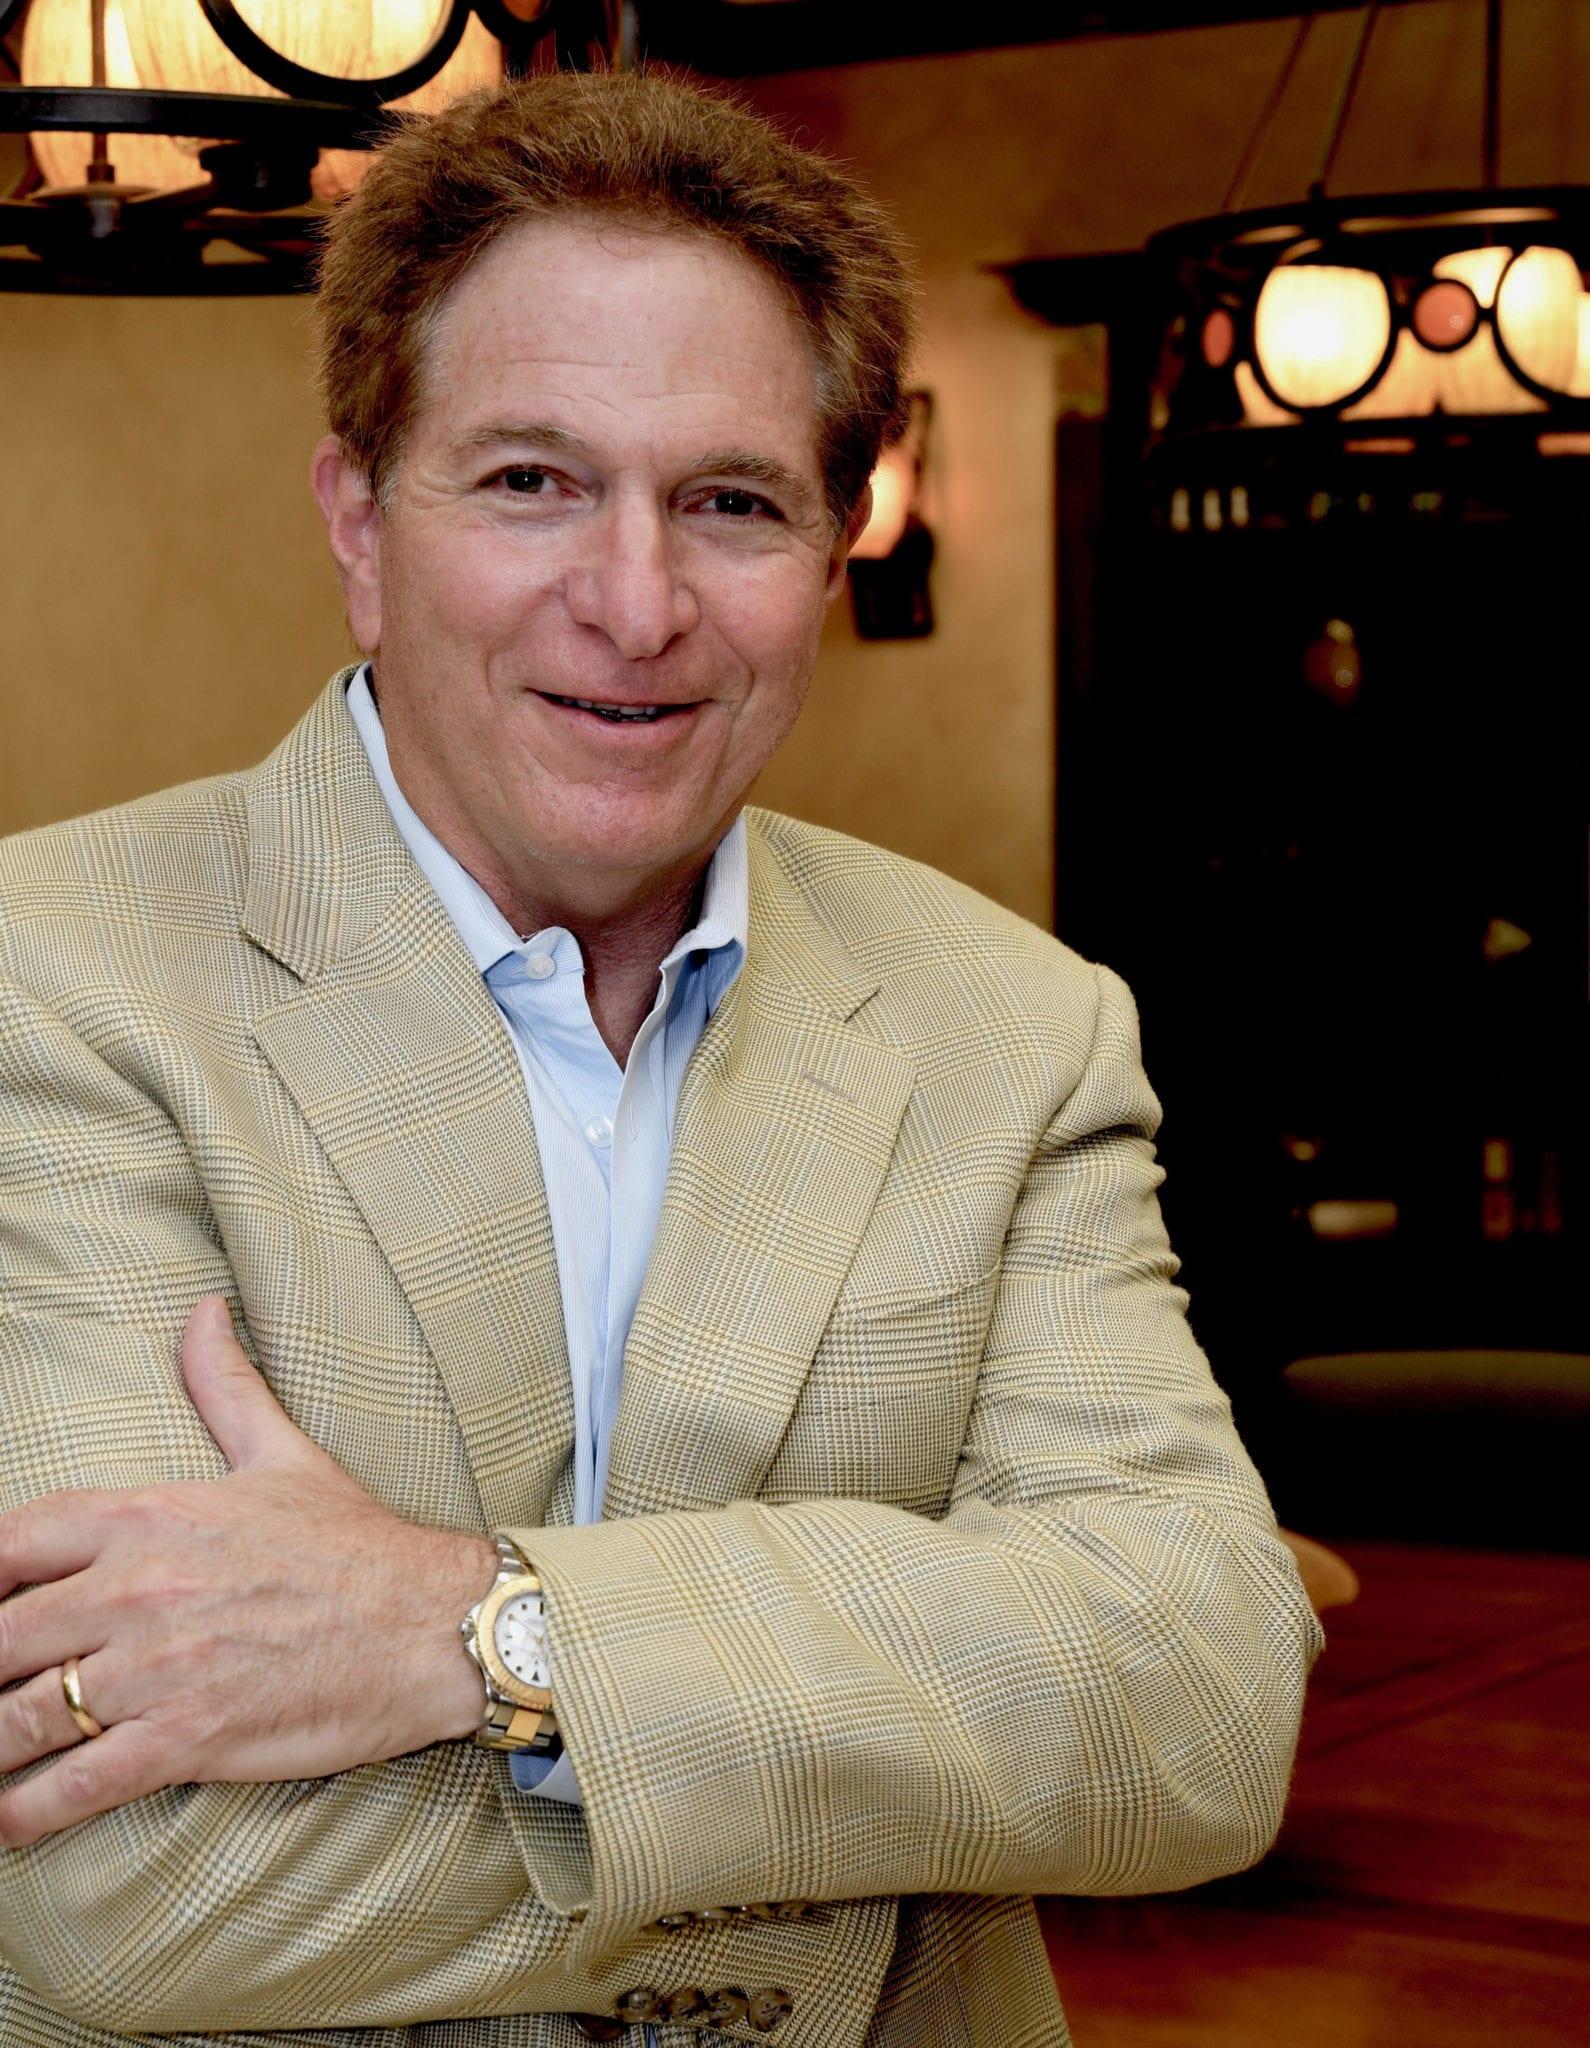 Jay M. Wasserman